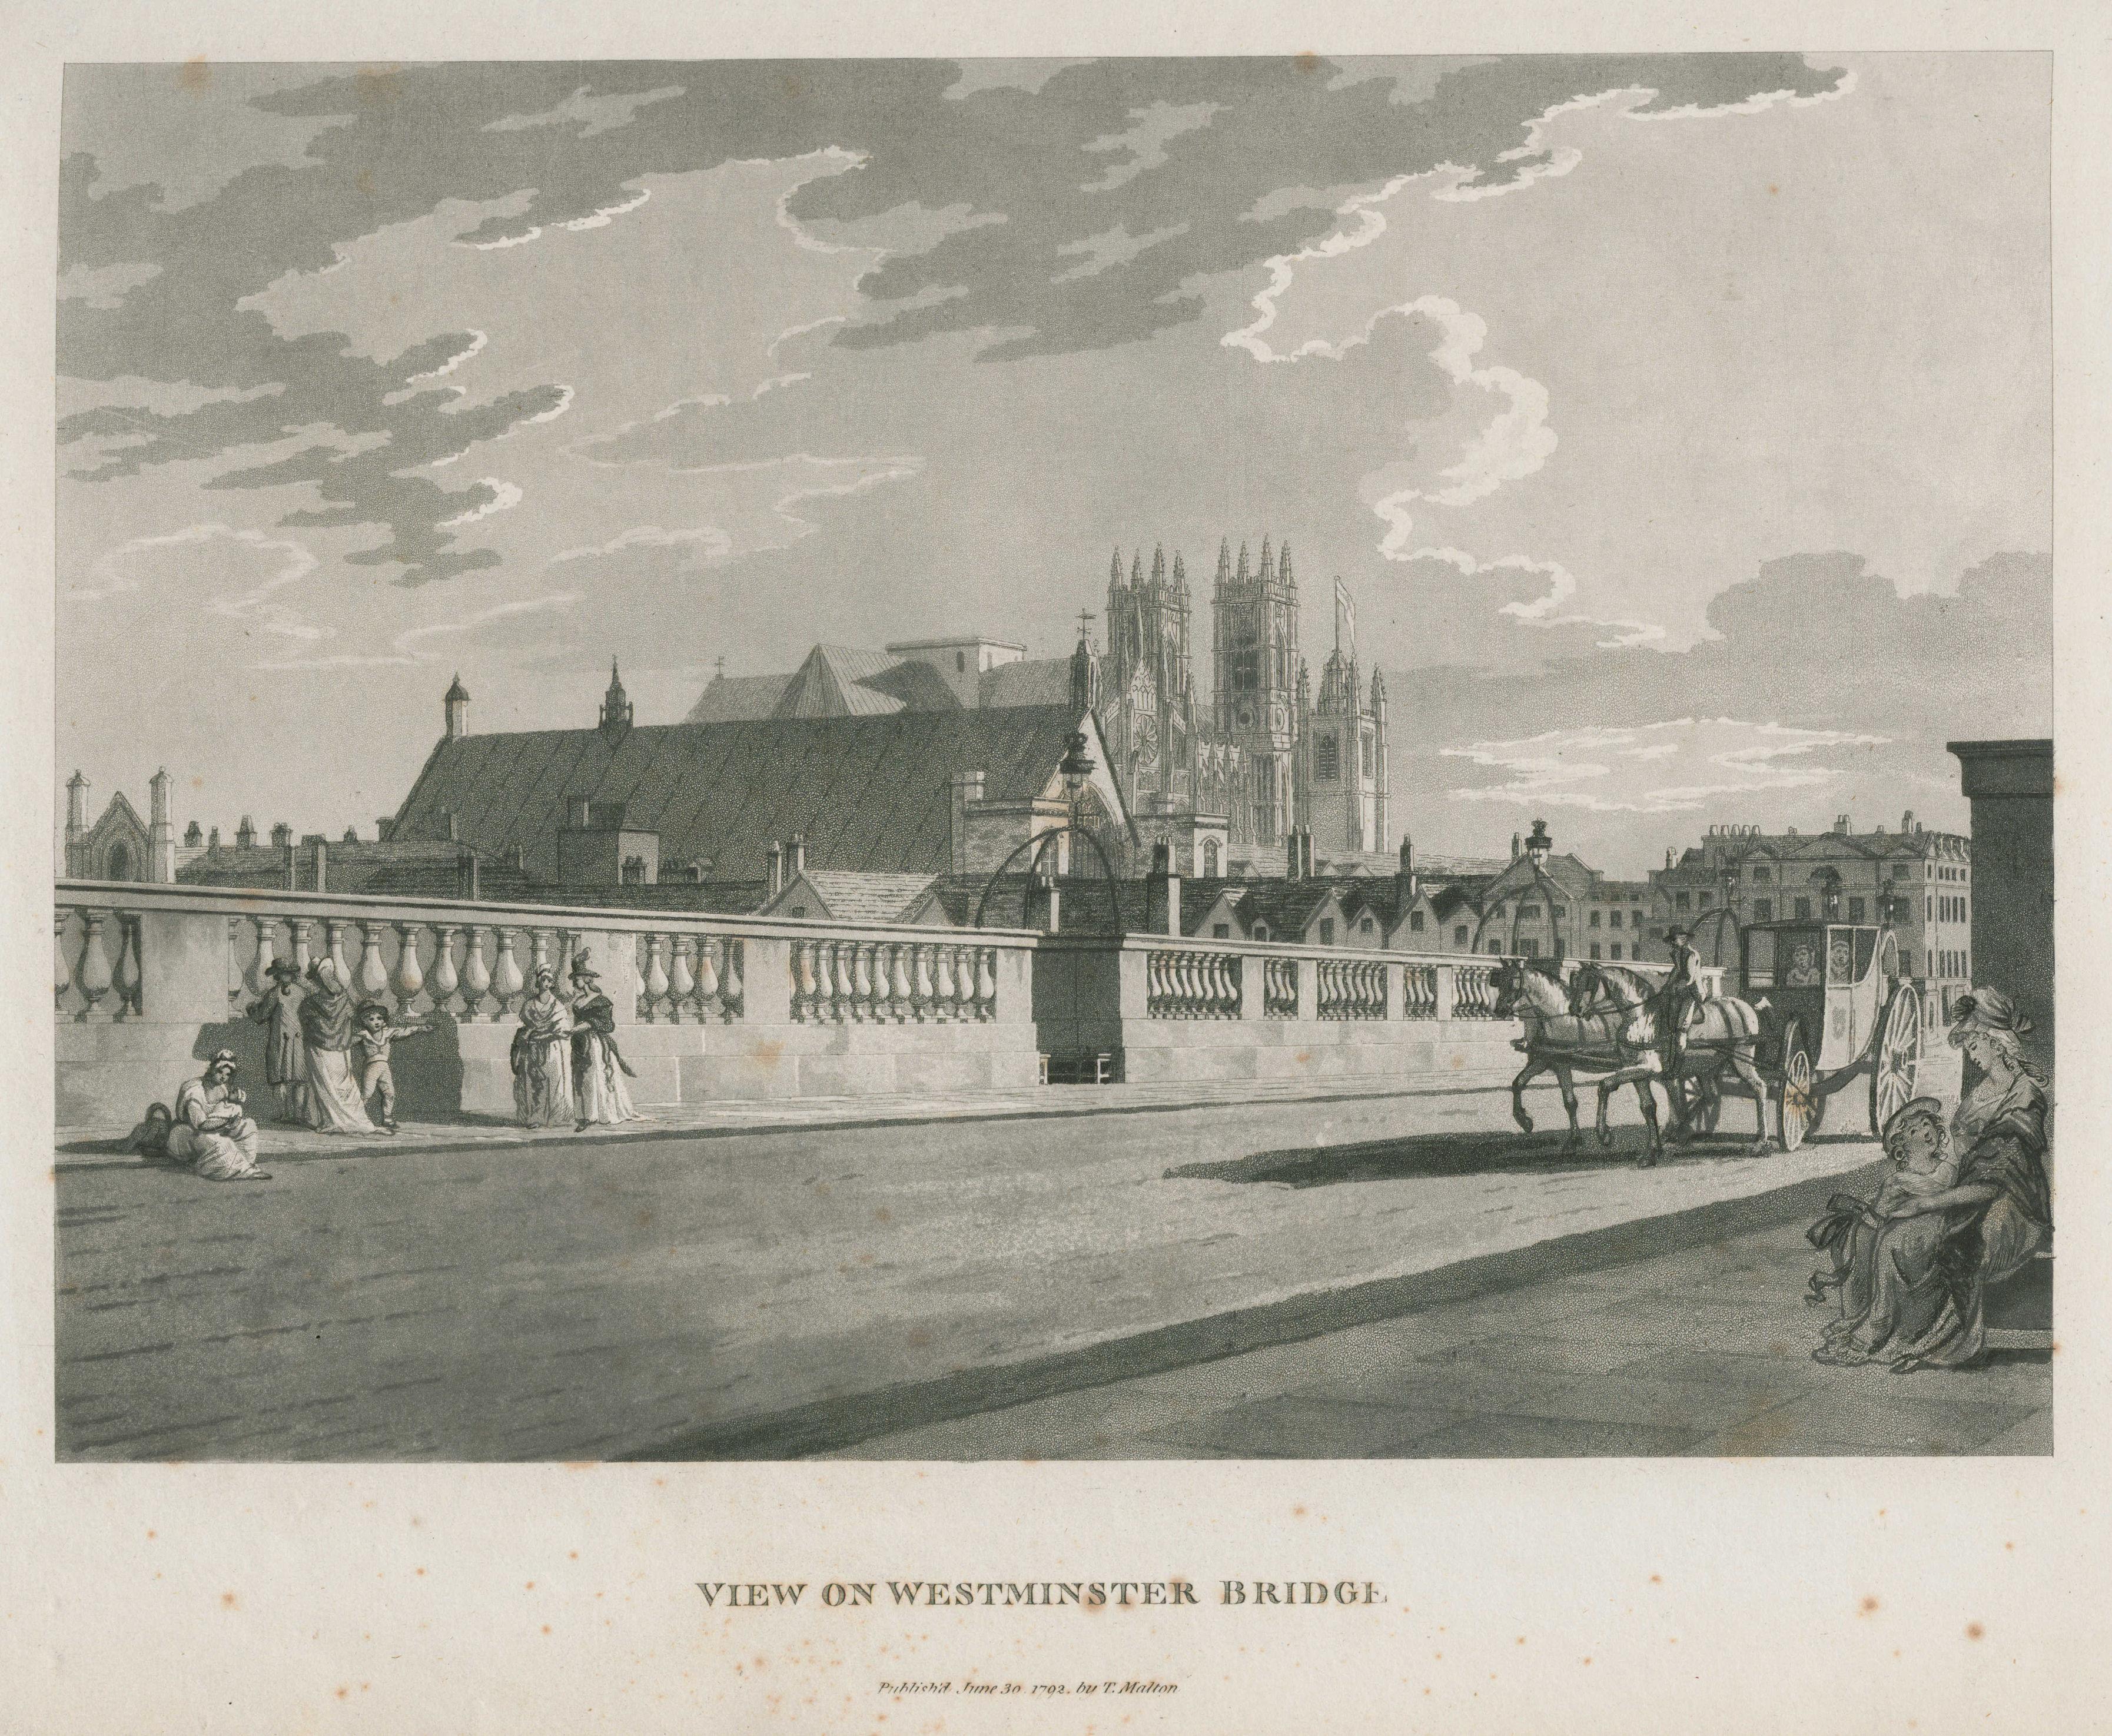 002 - Malton - View on Westminster Bridge